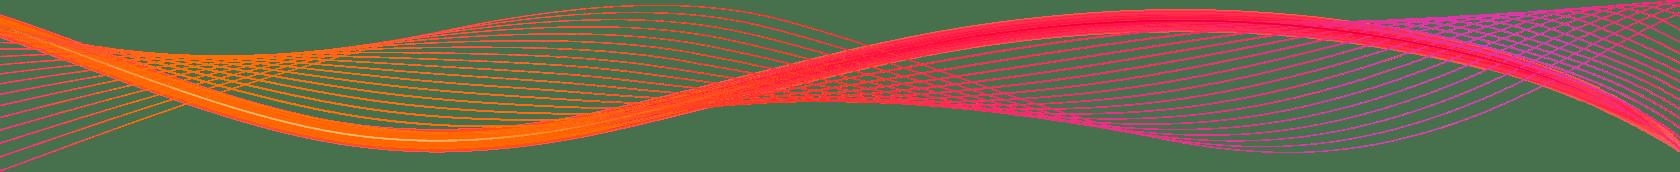 lines-pattern-bg